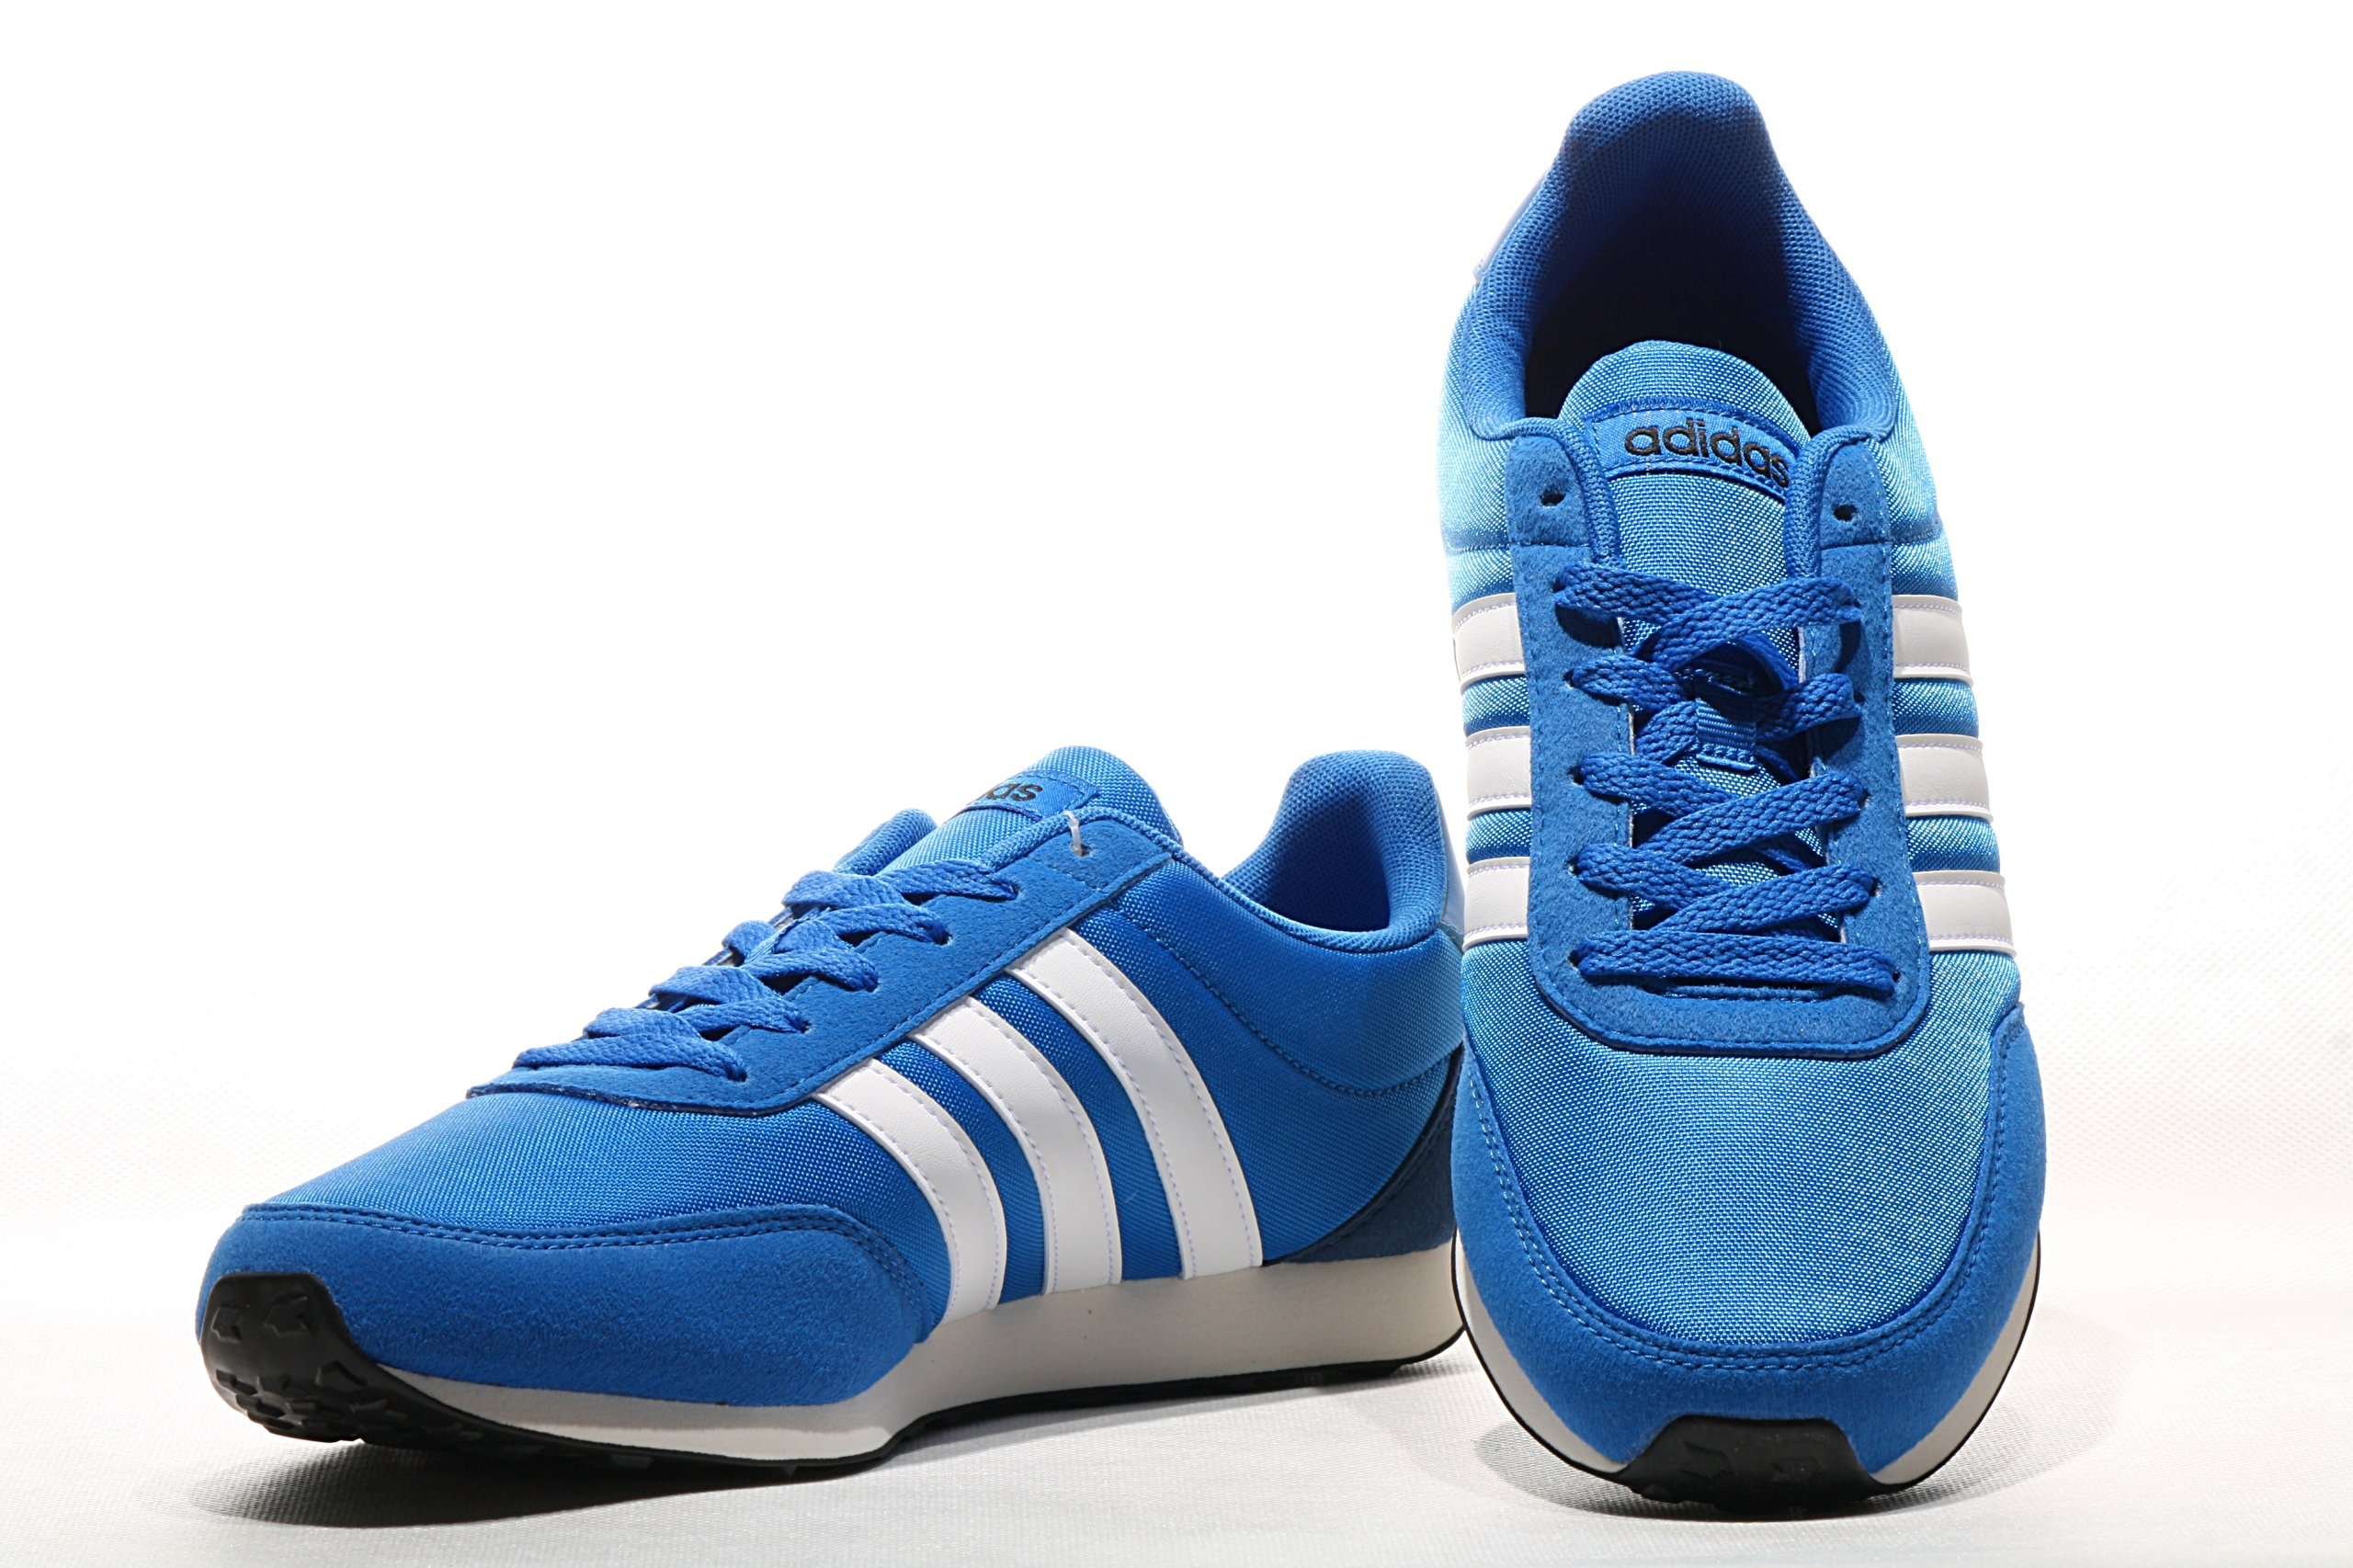 Buty męskie Adidas NEO V RACER 2.0 (BC0107) 4423